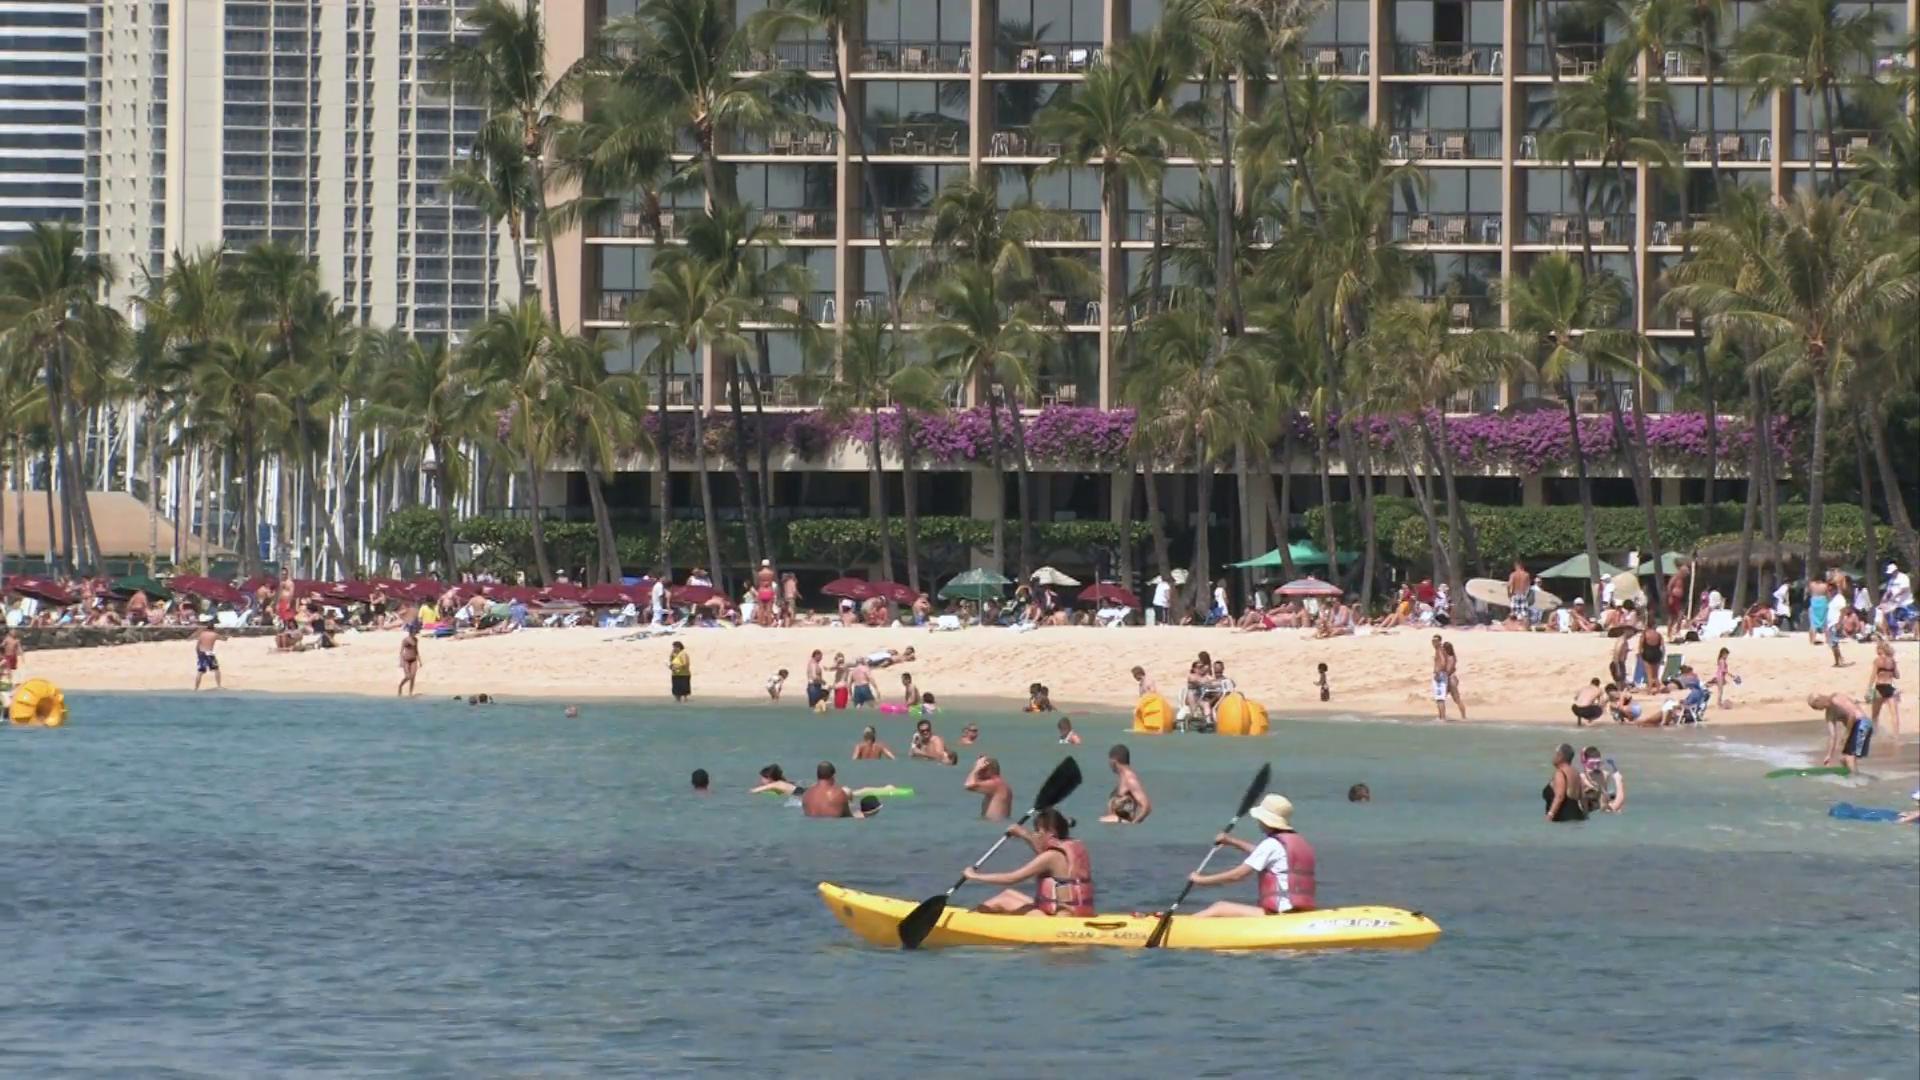 Waikiki Beach ocean kayak M HD Stock Video Footage   Storyblocks Video 1920x1080